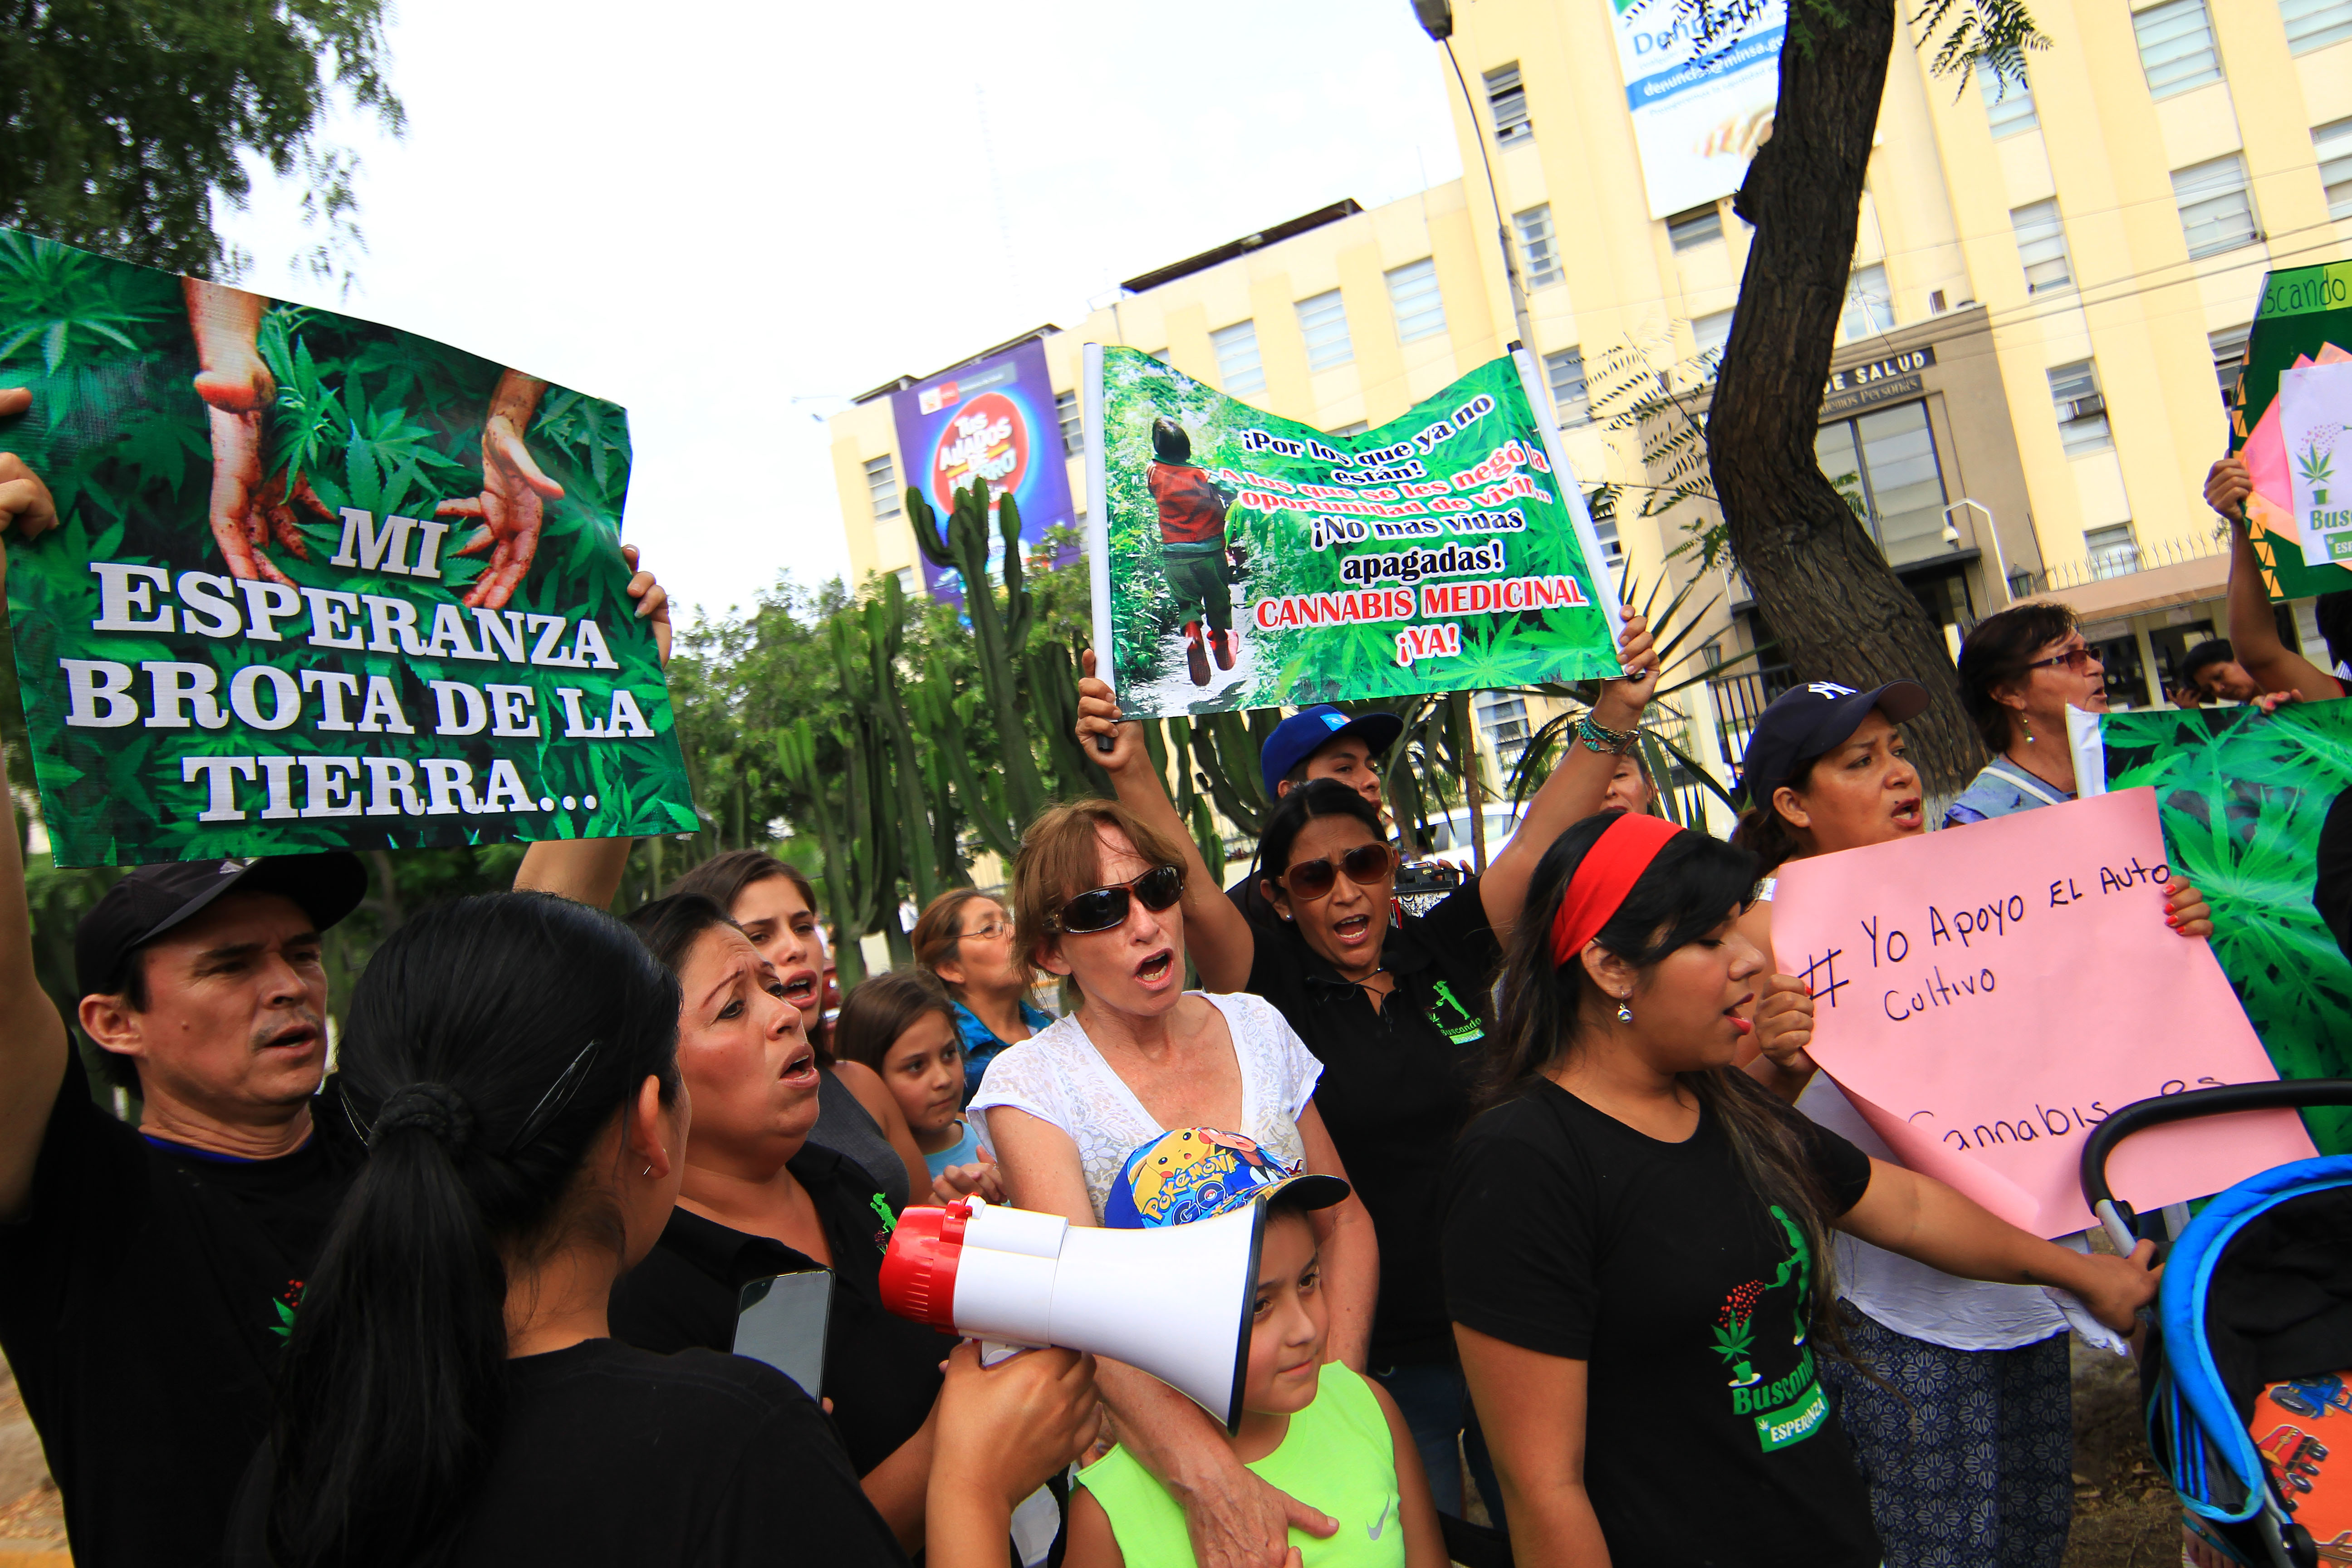 Marihuana medicinal: Una esperanza aún ilegal en el Perú